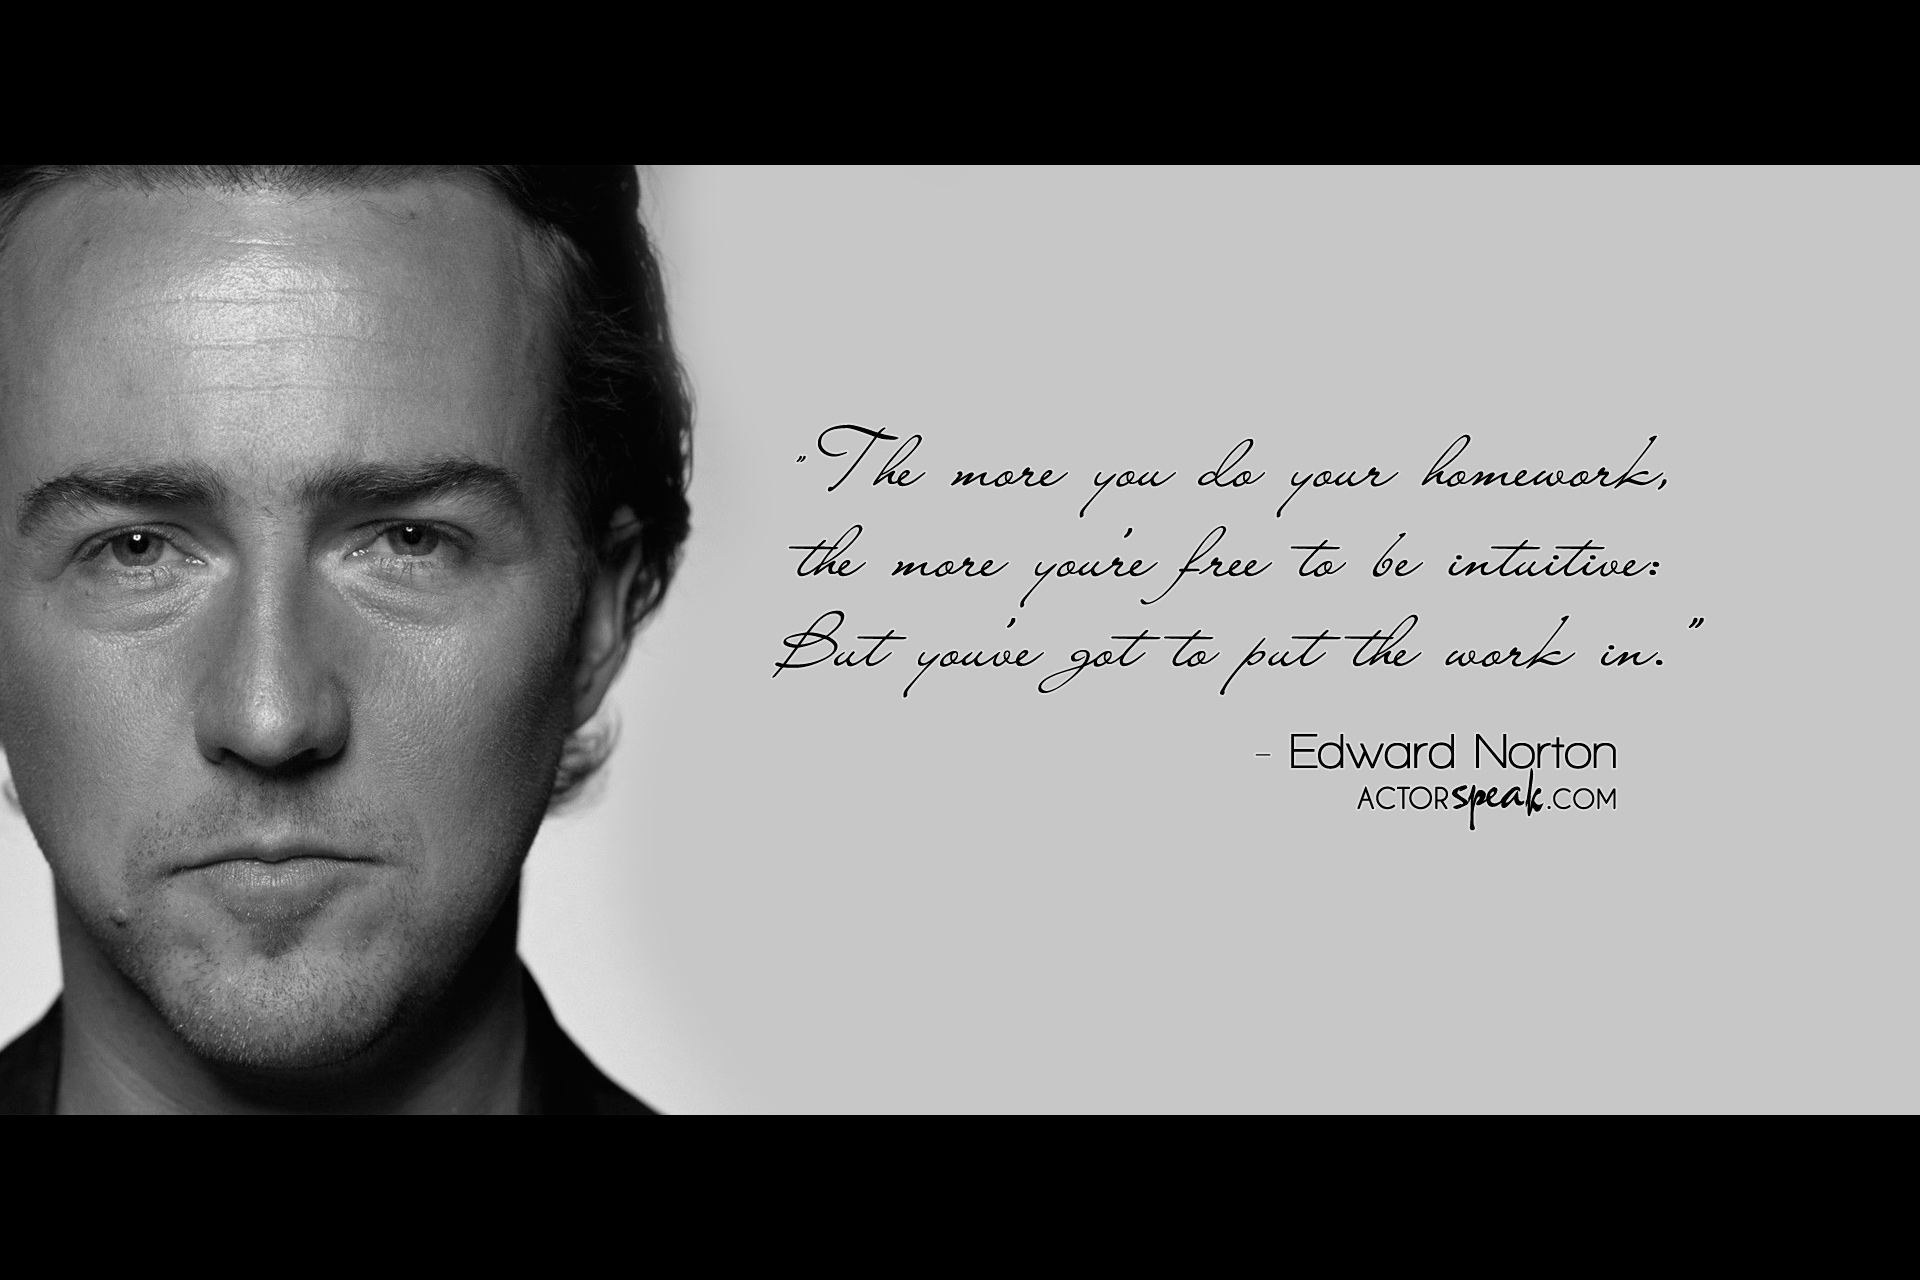 Actor quote #2